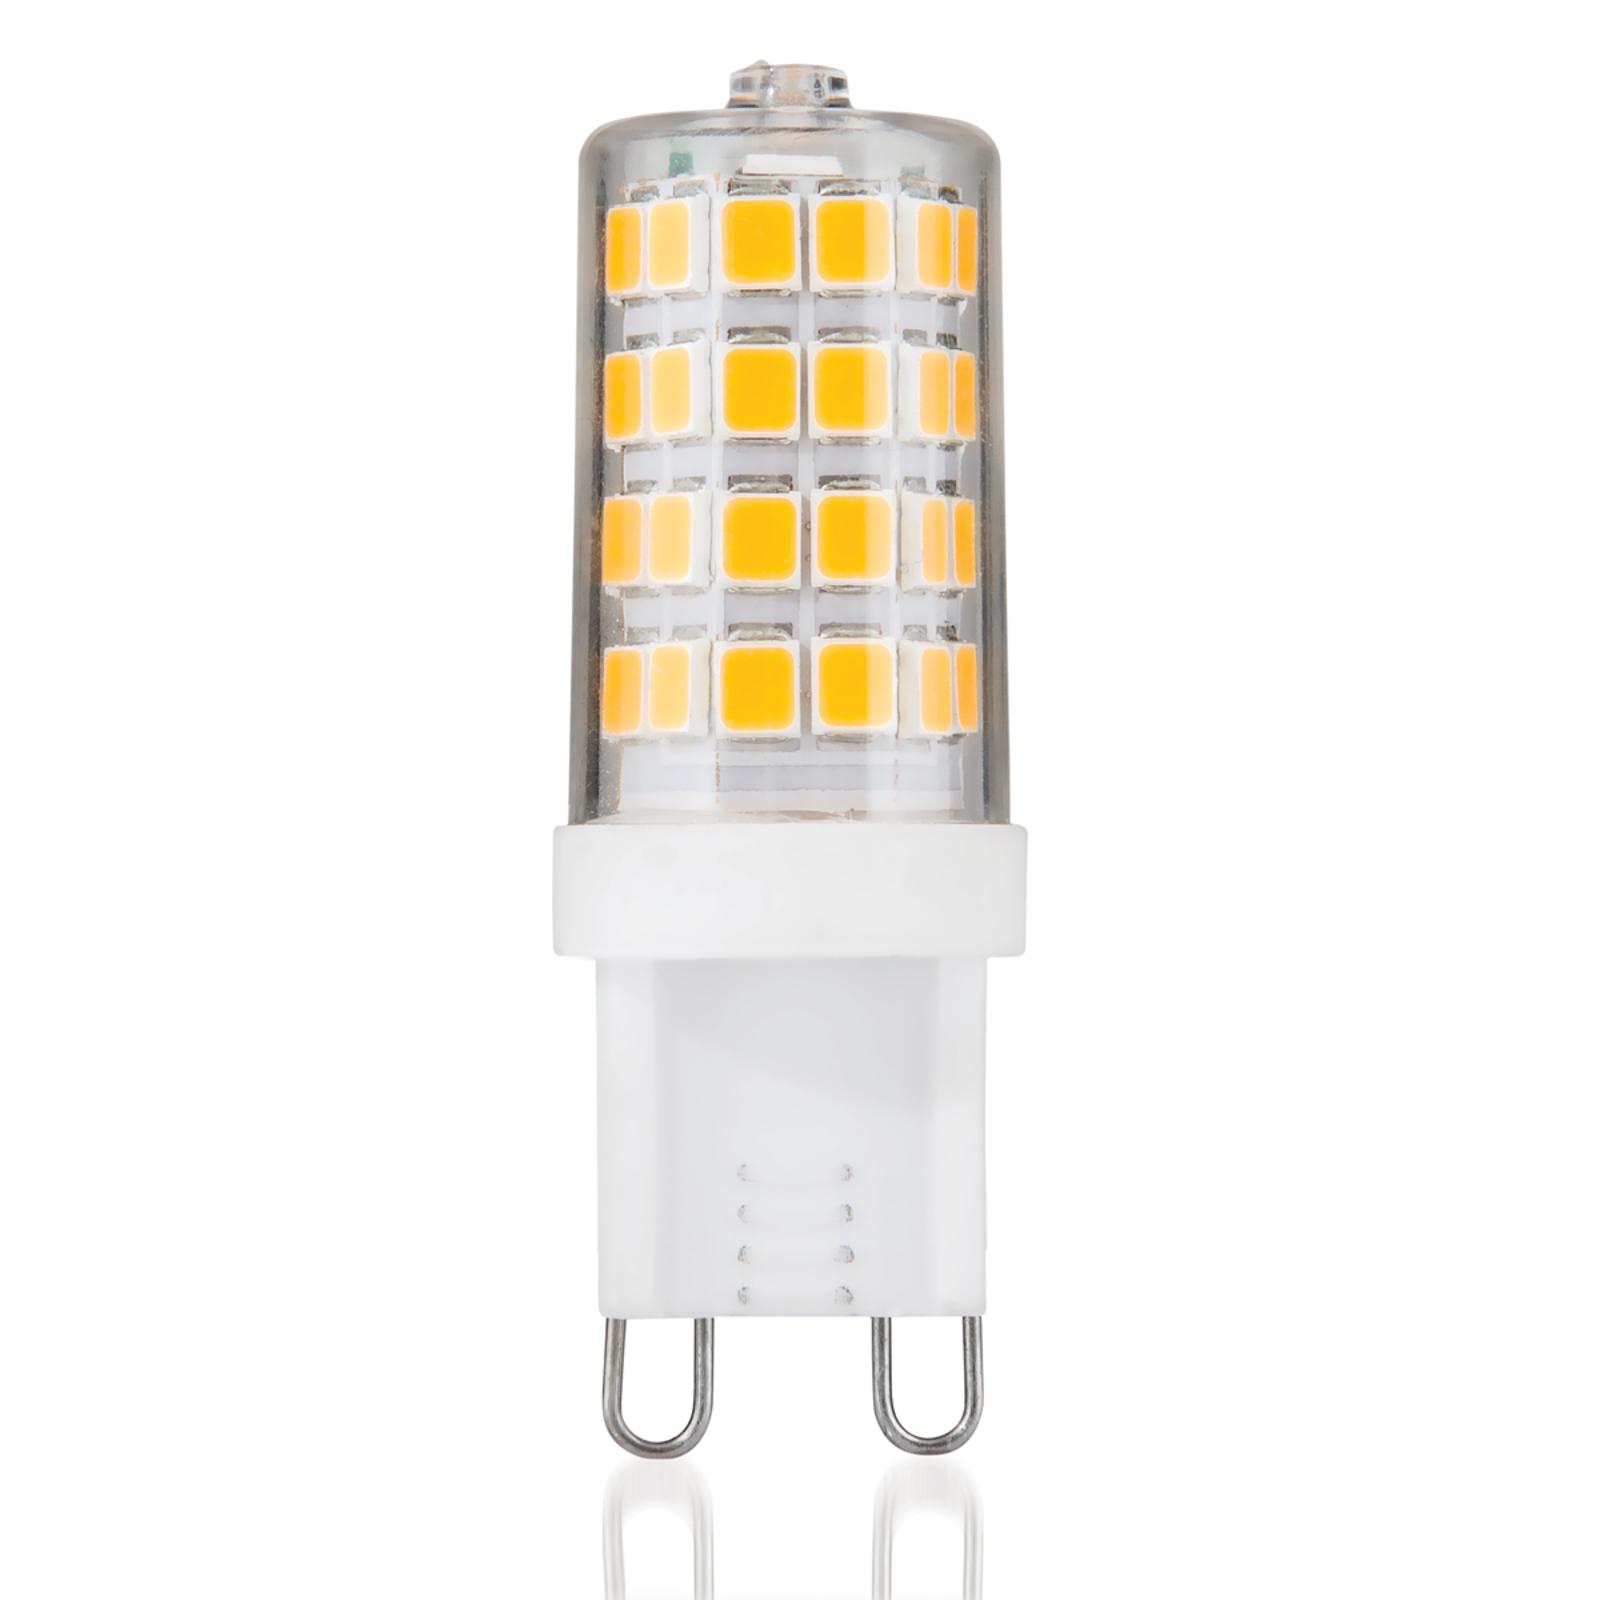 G9 4W 828 LED stiftlamp